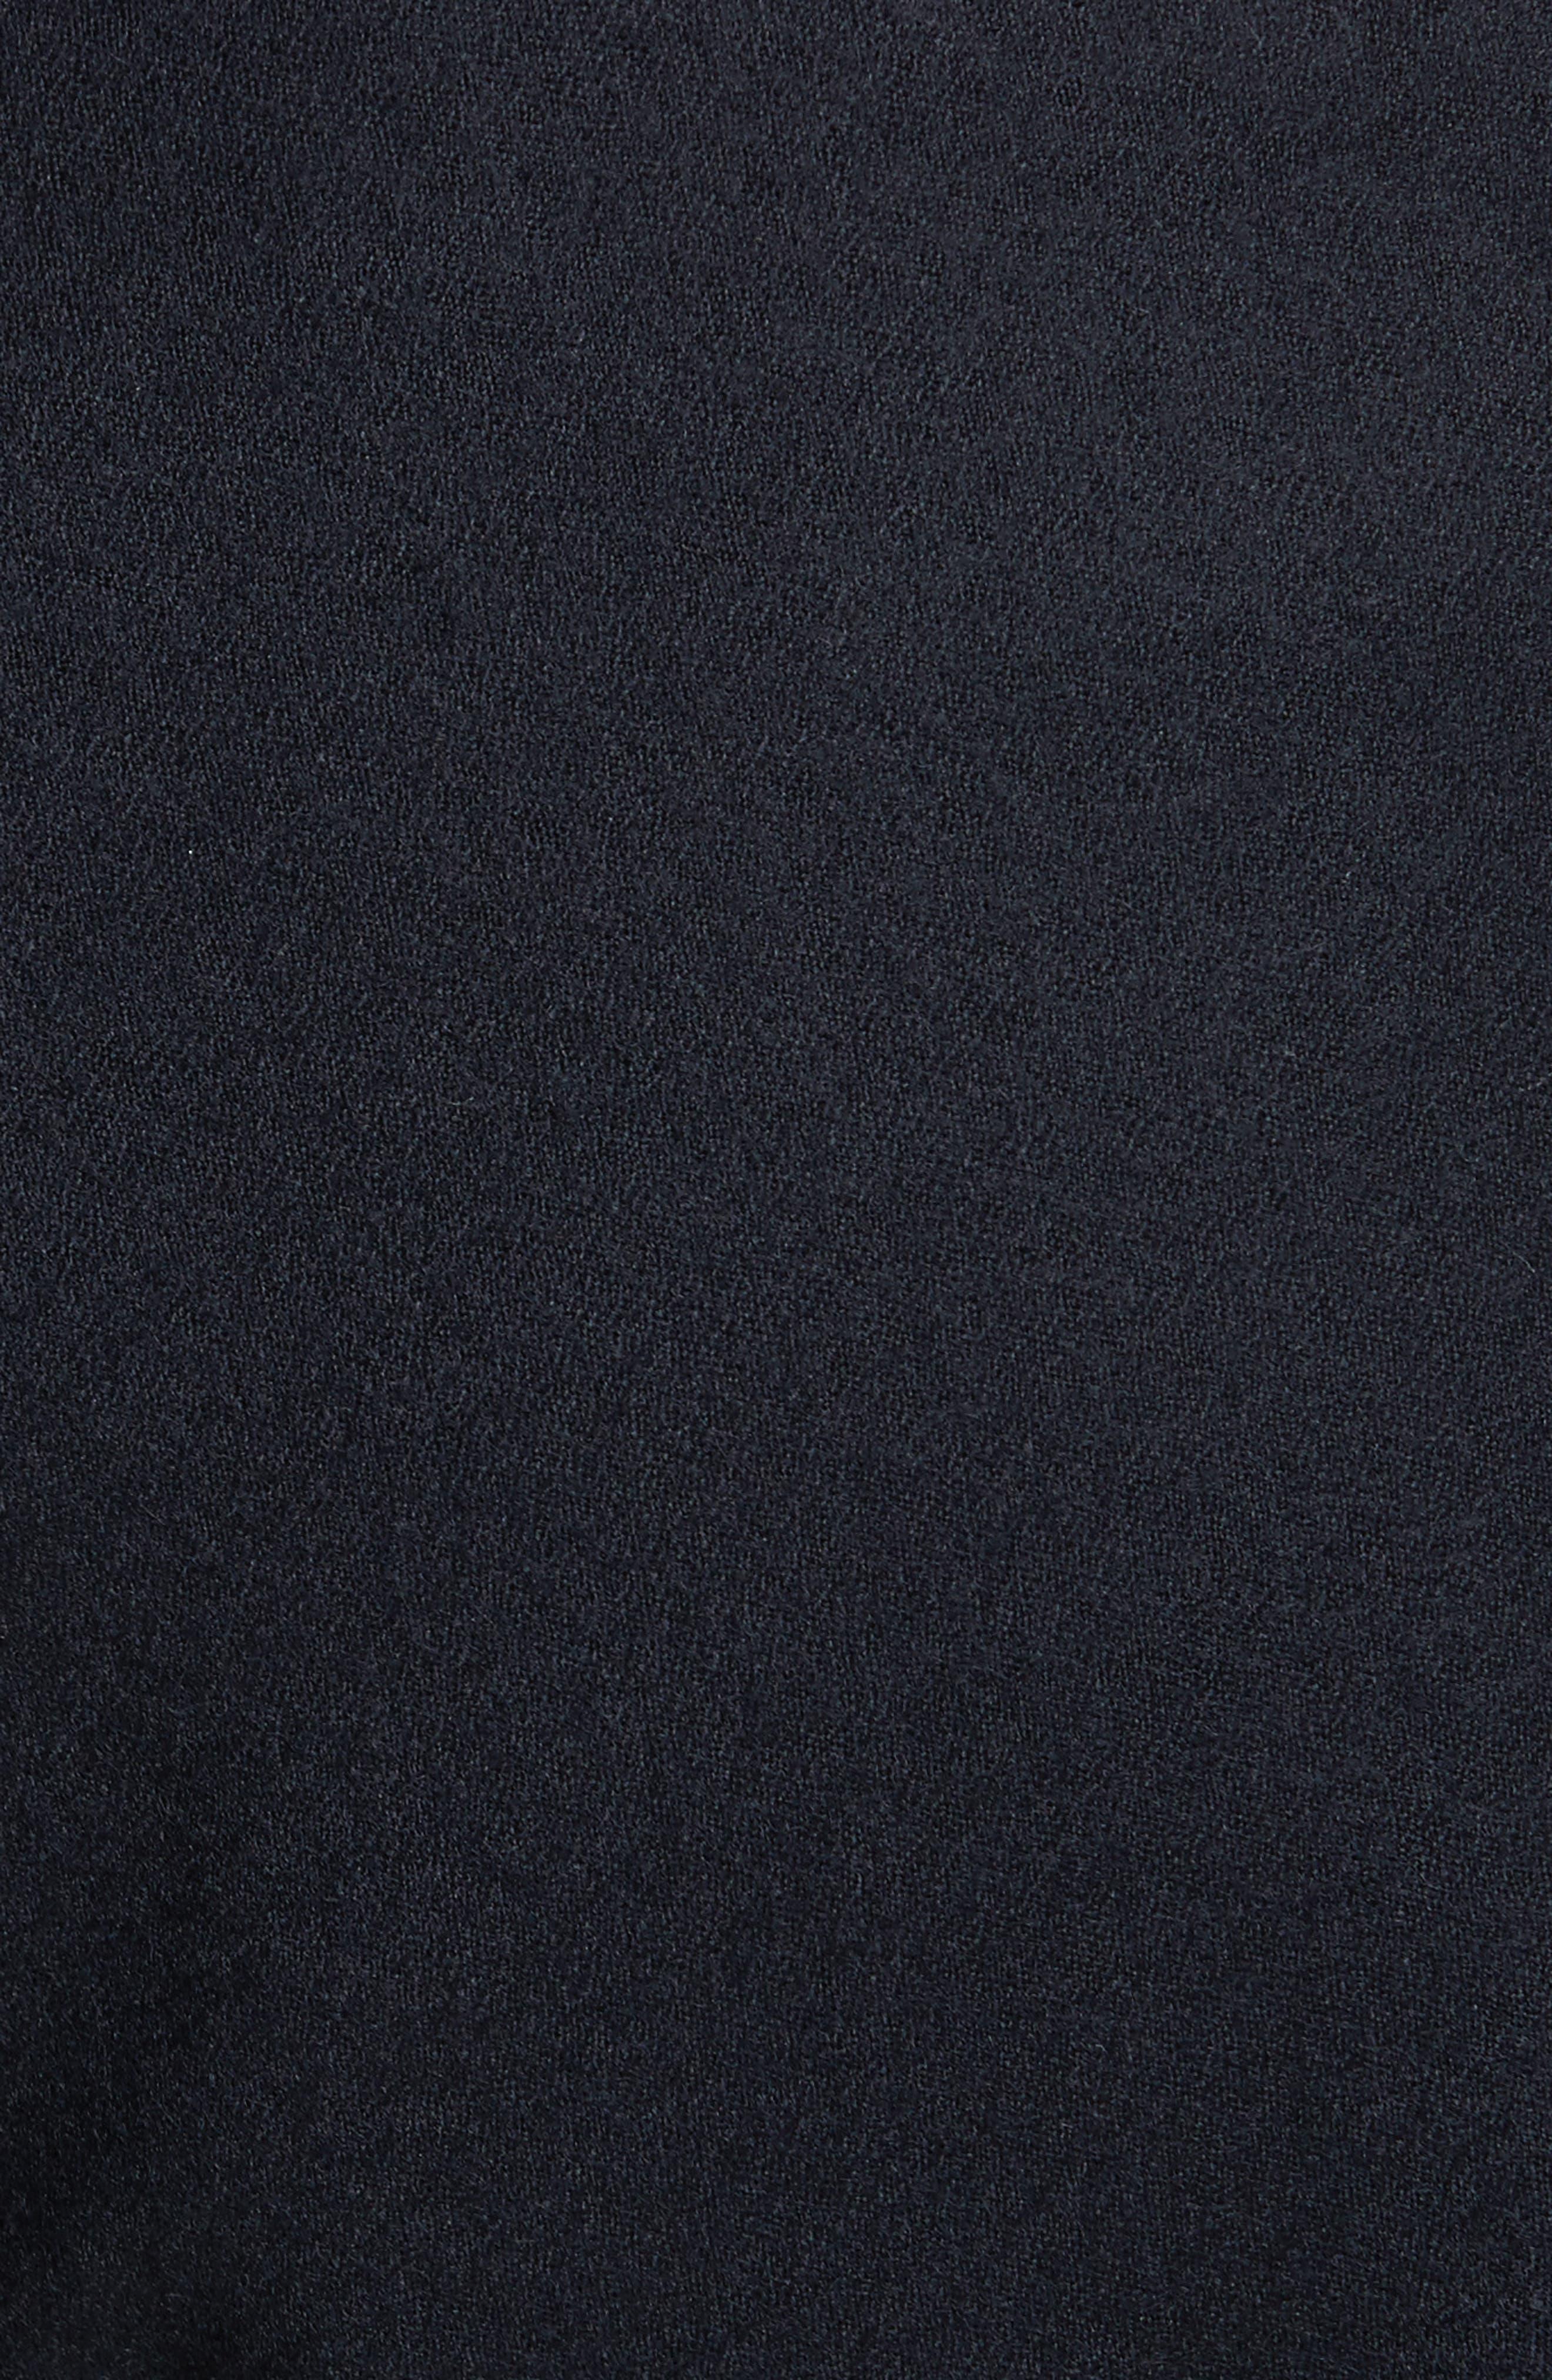 Alternate Image 2  - Paul Smith Drawstring Trousers